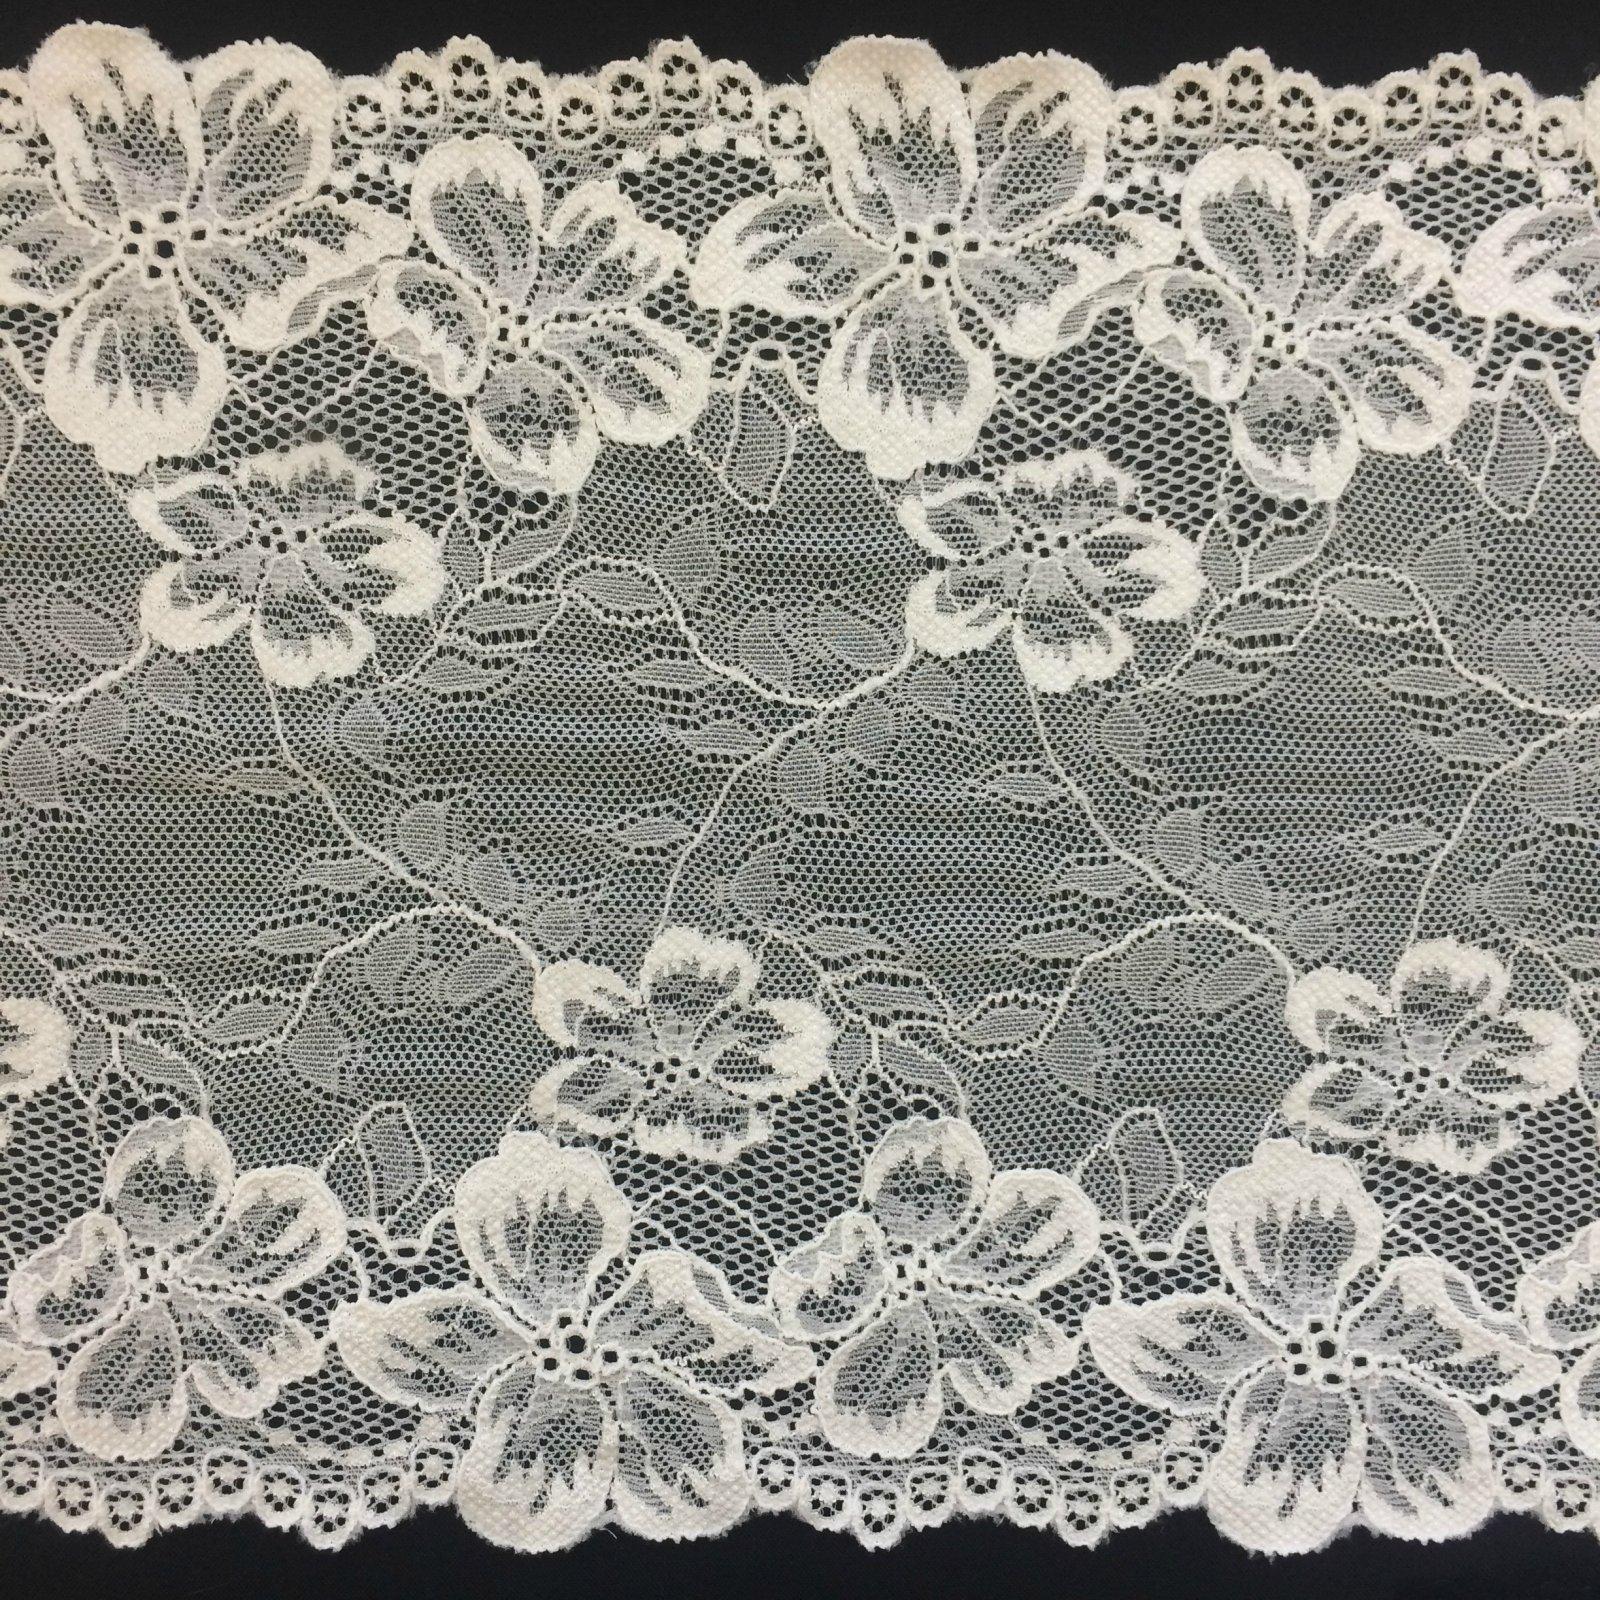 8 5/8 Wide Stretch Floral & Vine Lace Trim - Ivory